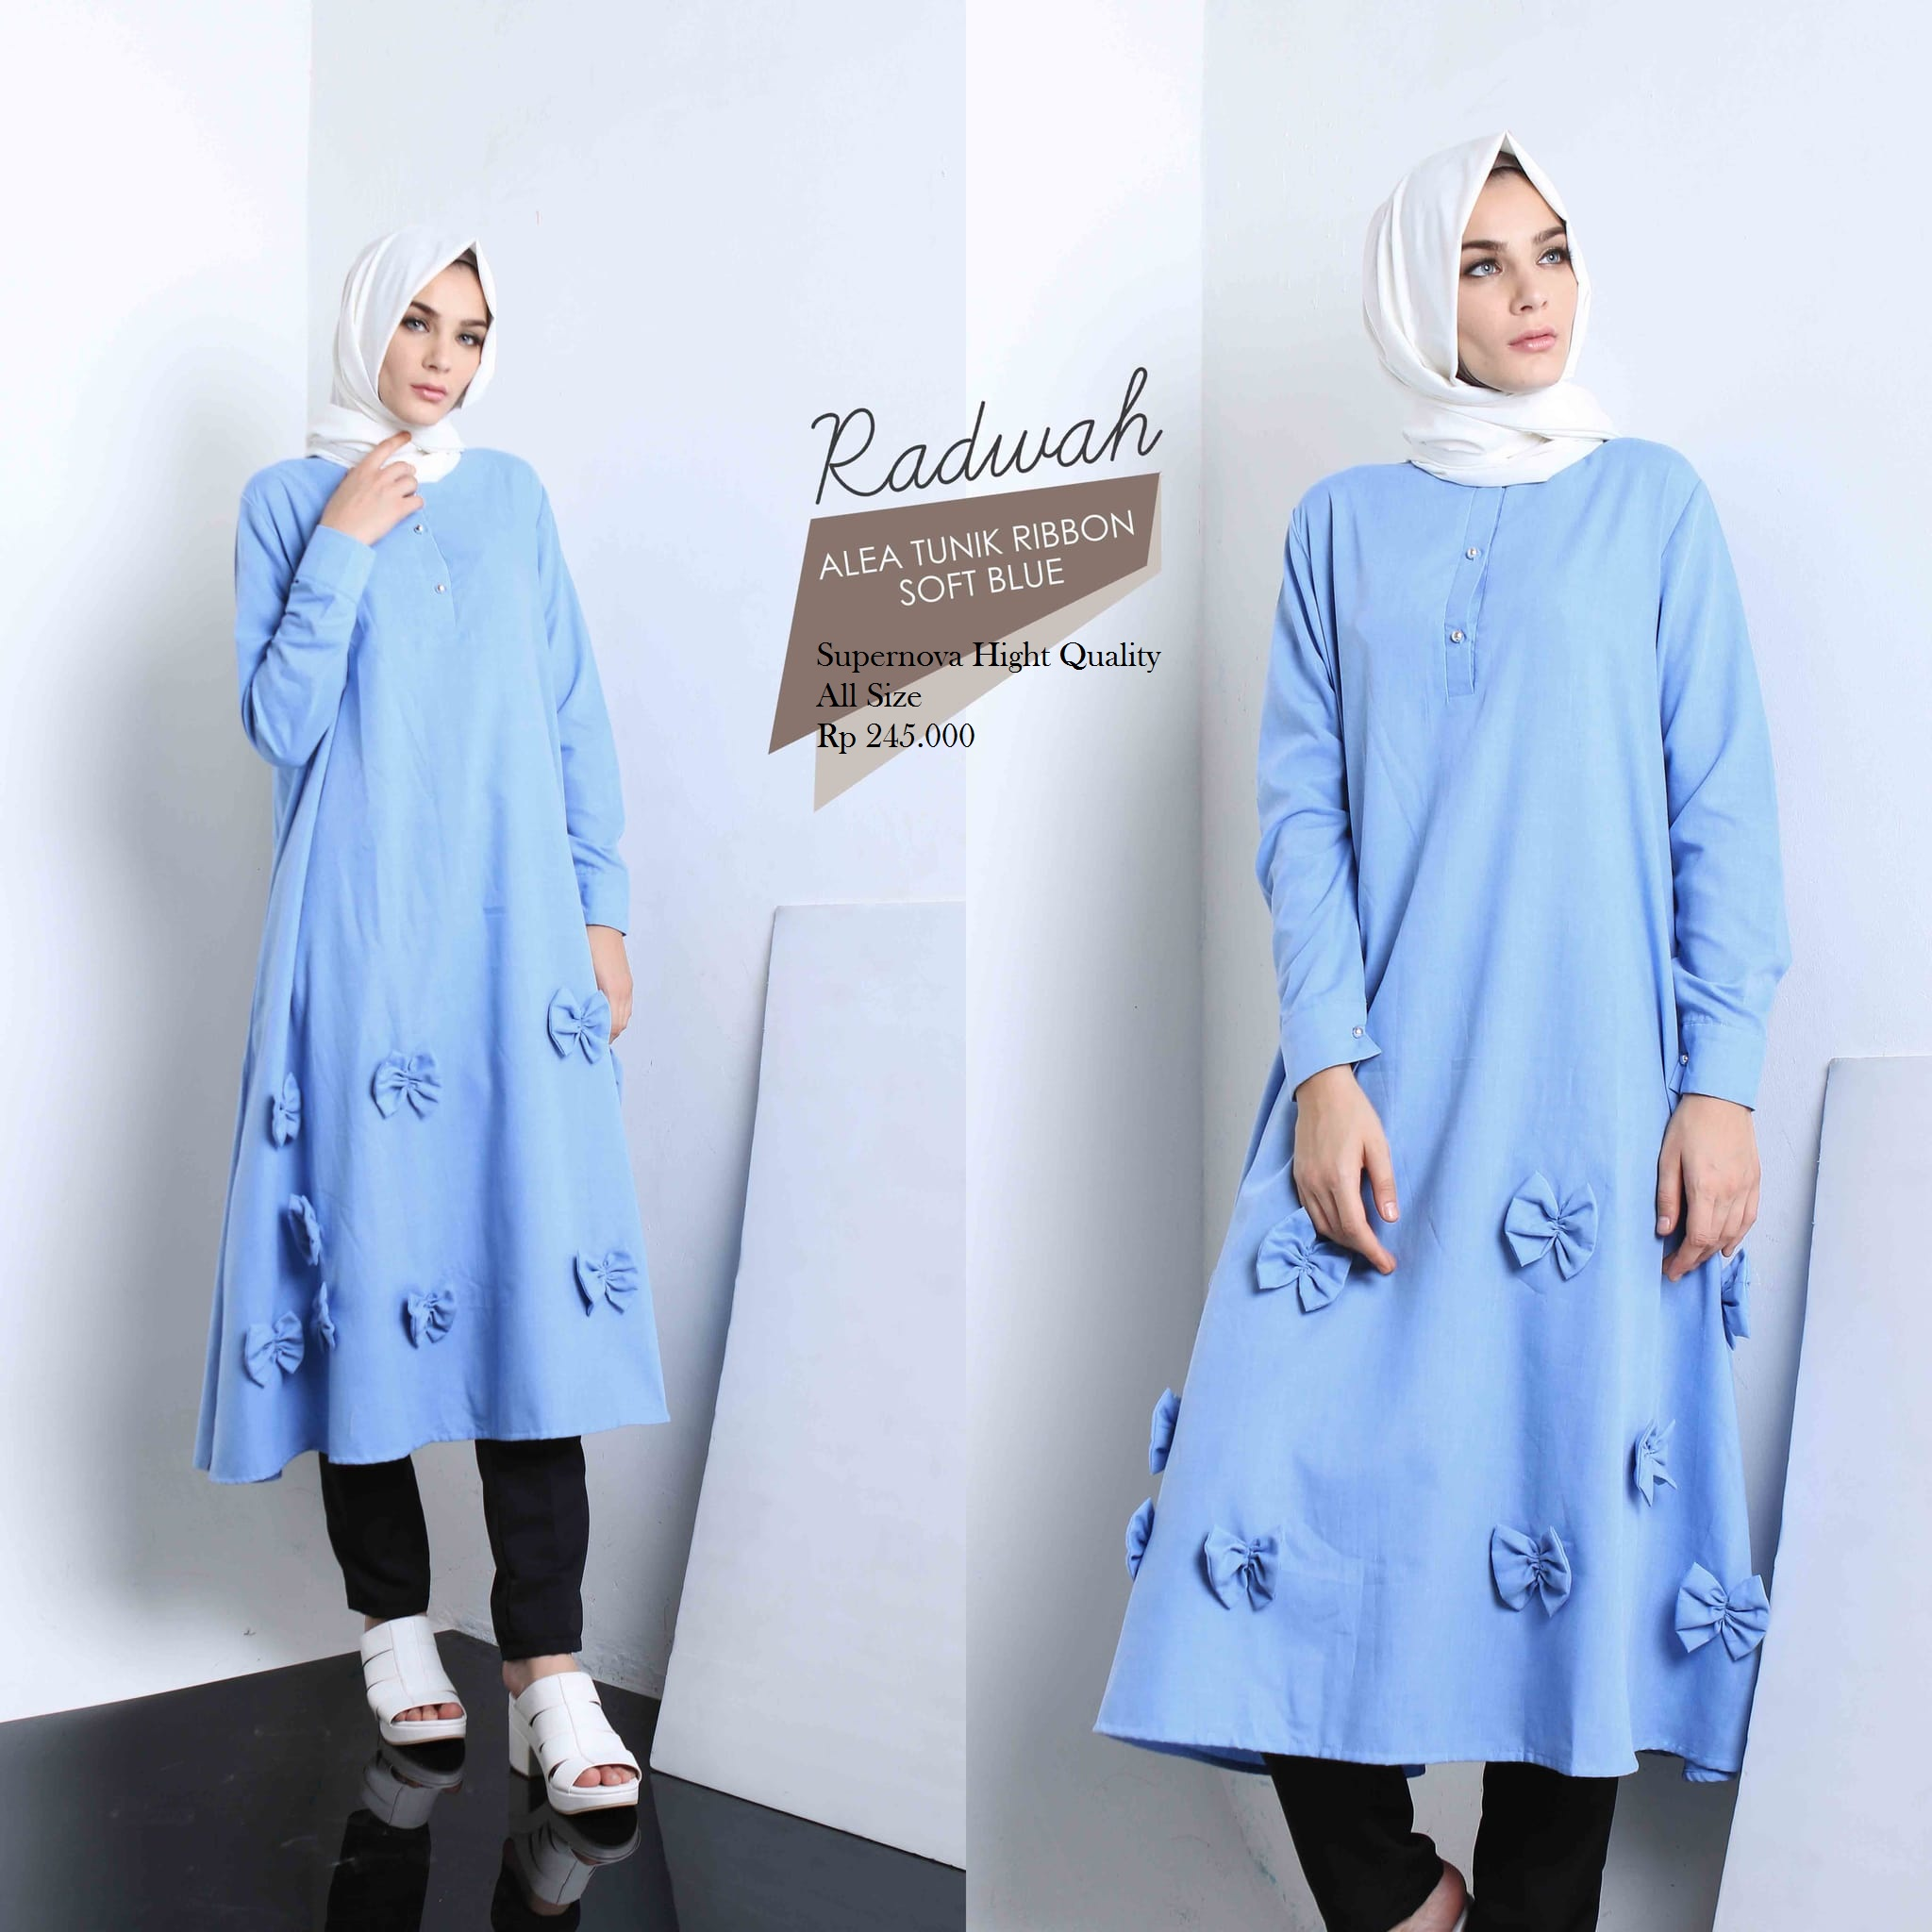 Jual Blus Alea Tunik Ribbon By Radwah Ad Fashion Tokopedia